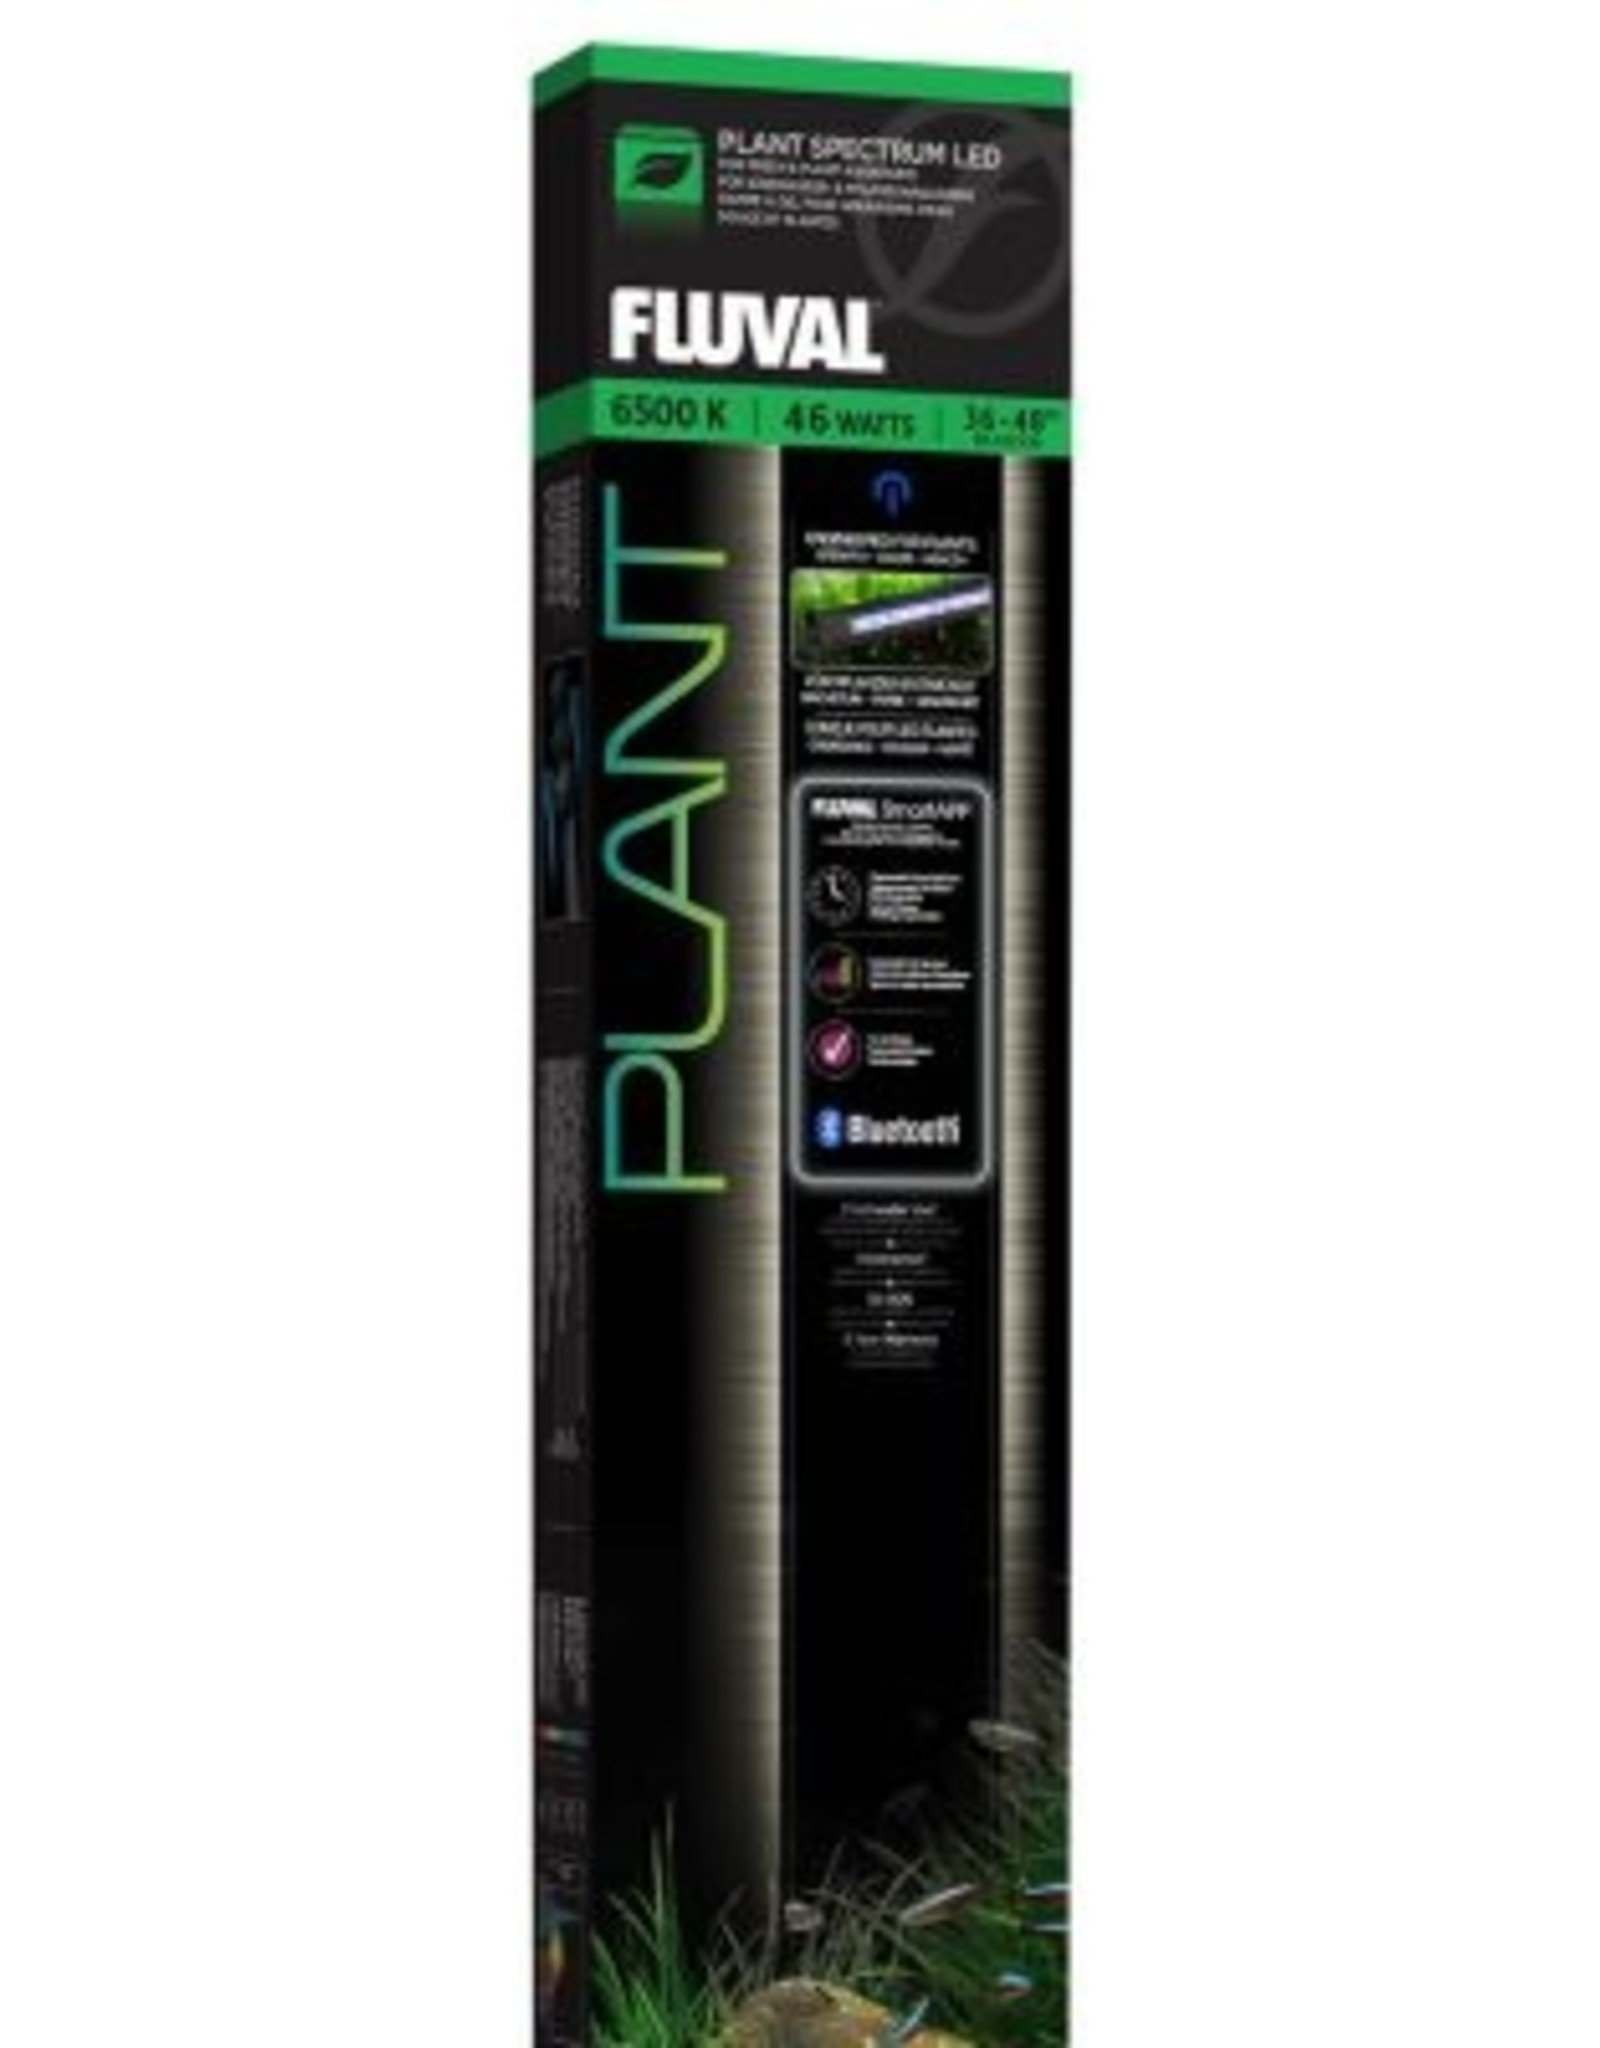 "FLUVAL FLUVAL PLANT  SPECTRUM BLUETOOTH LED 32W 36-46"""